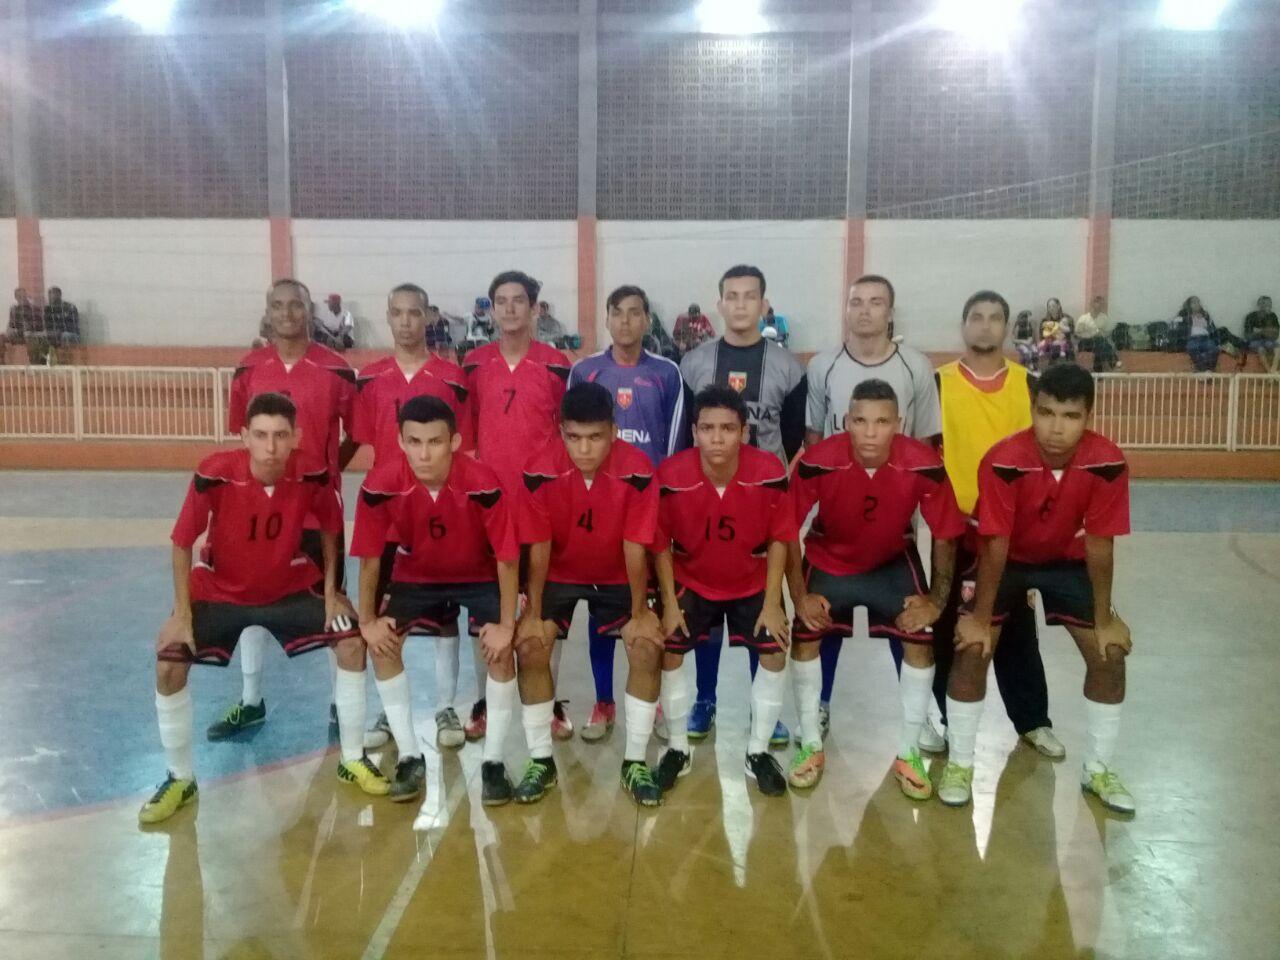 futsal jogos abertos da juventude 2018